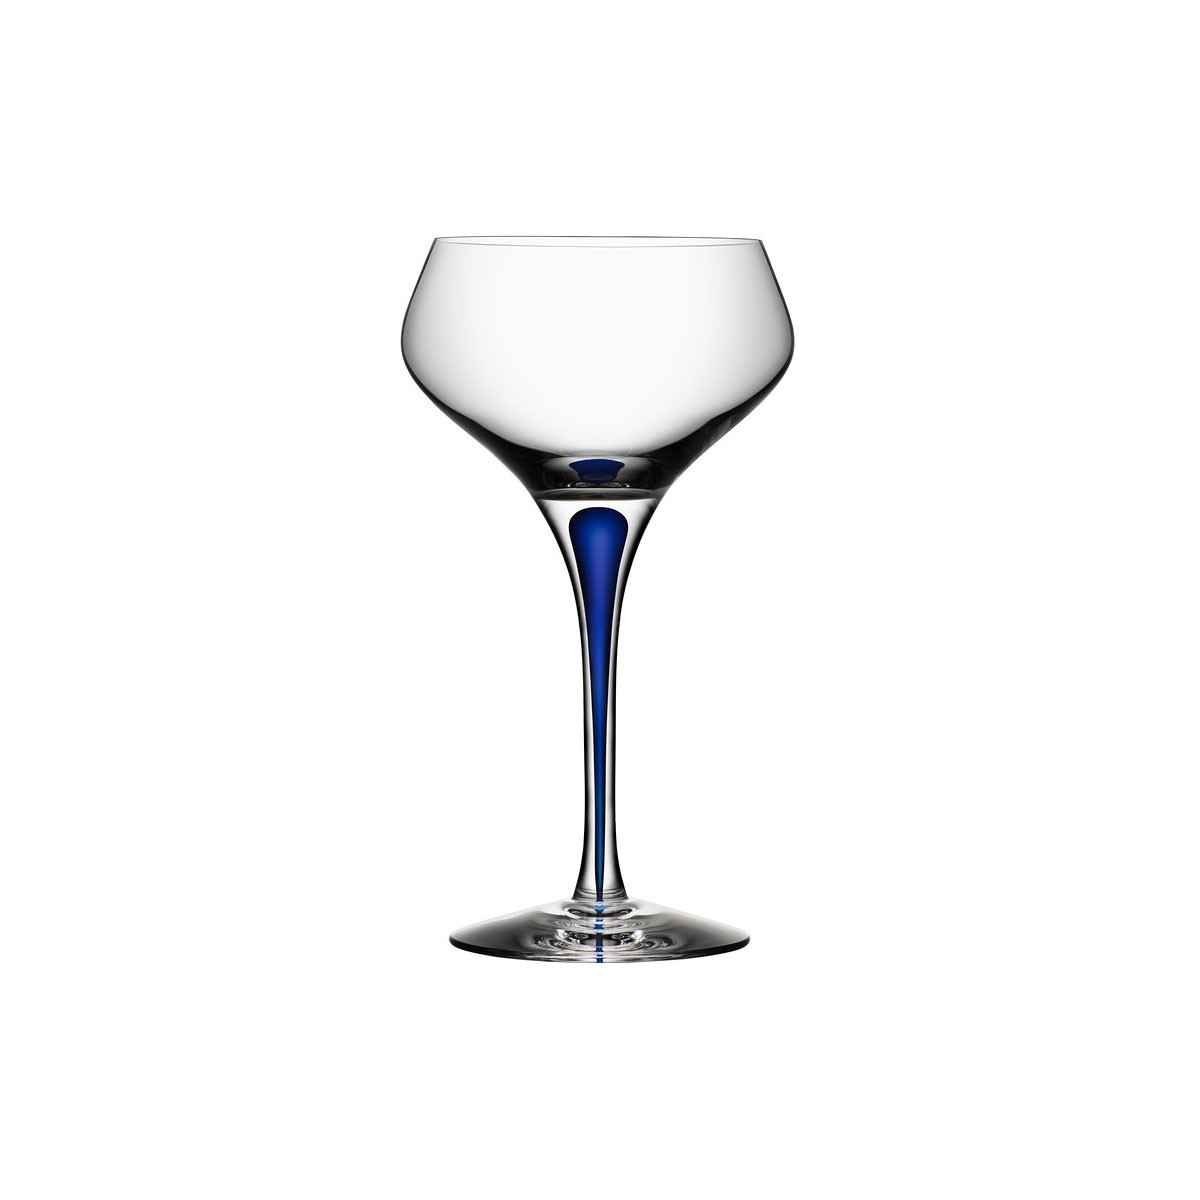 Orrefors Of Sweden I Intermezzo Blue Champagne Coupe 29 cl